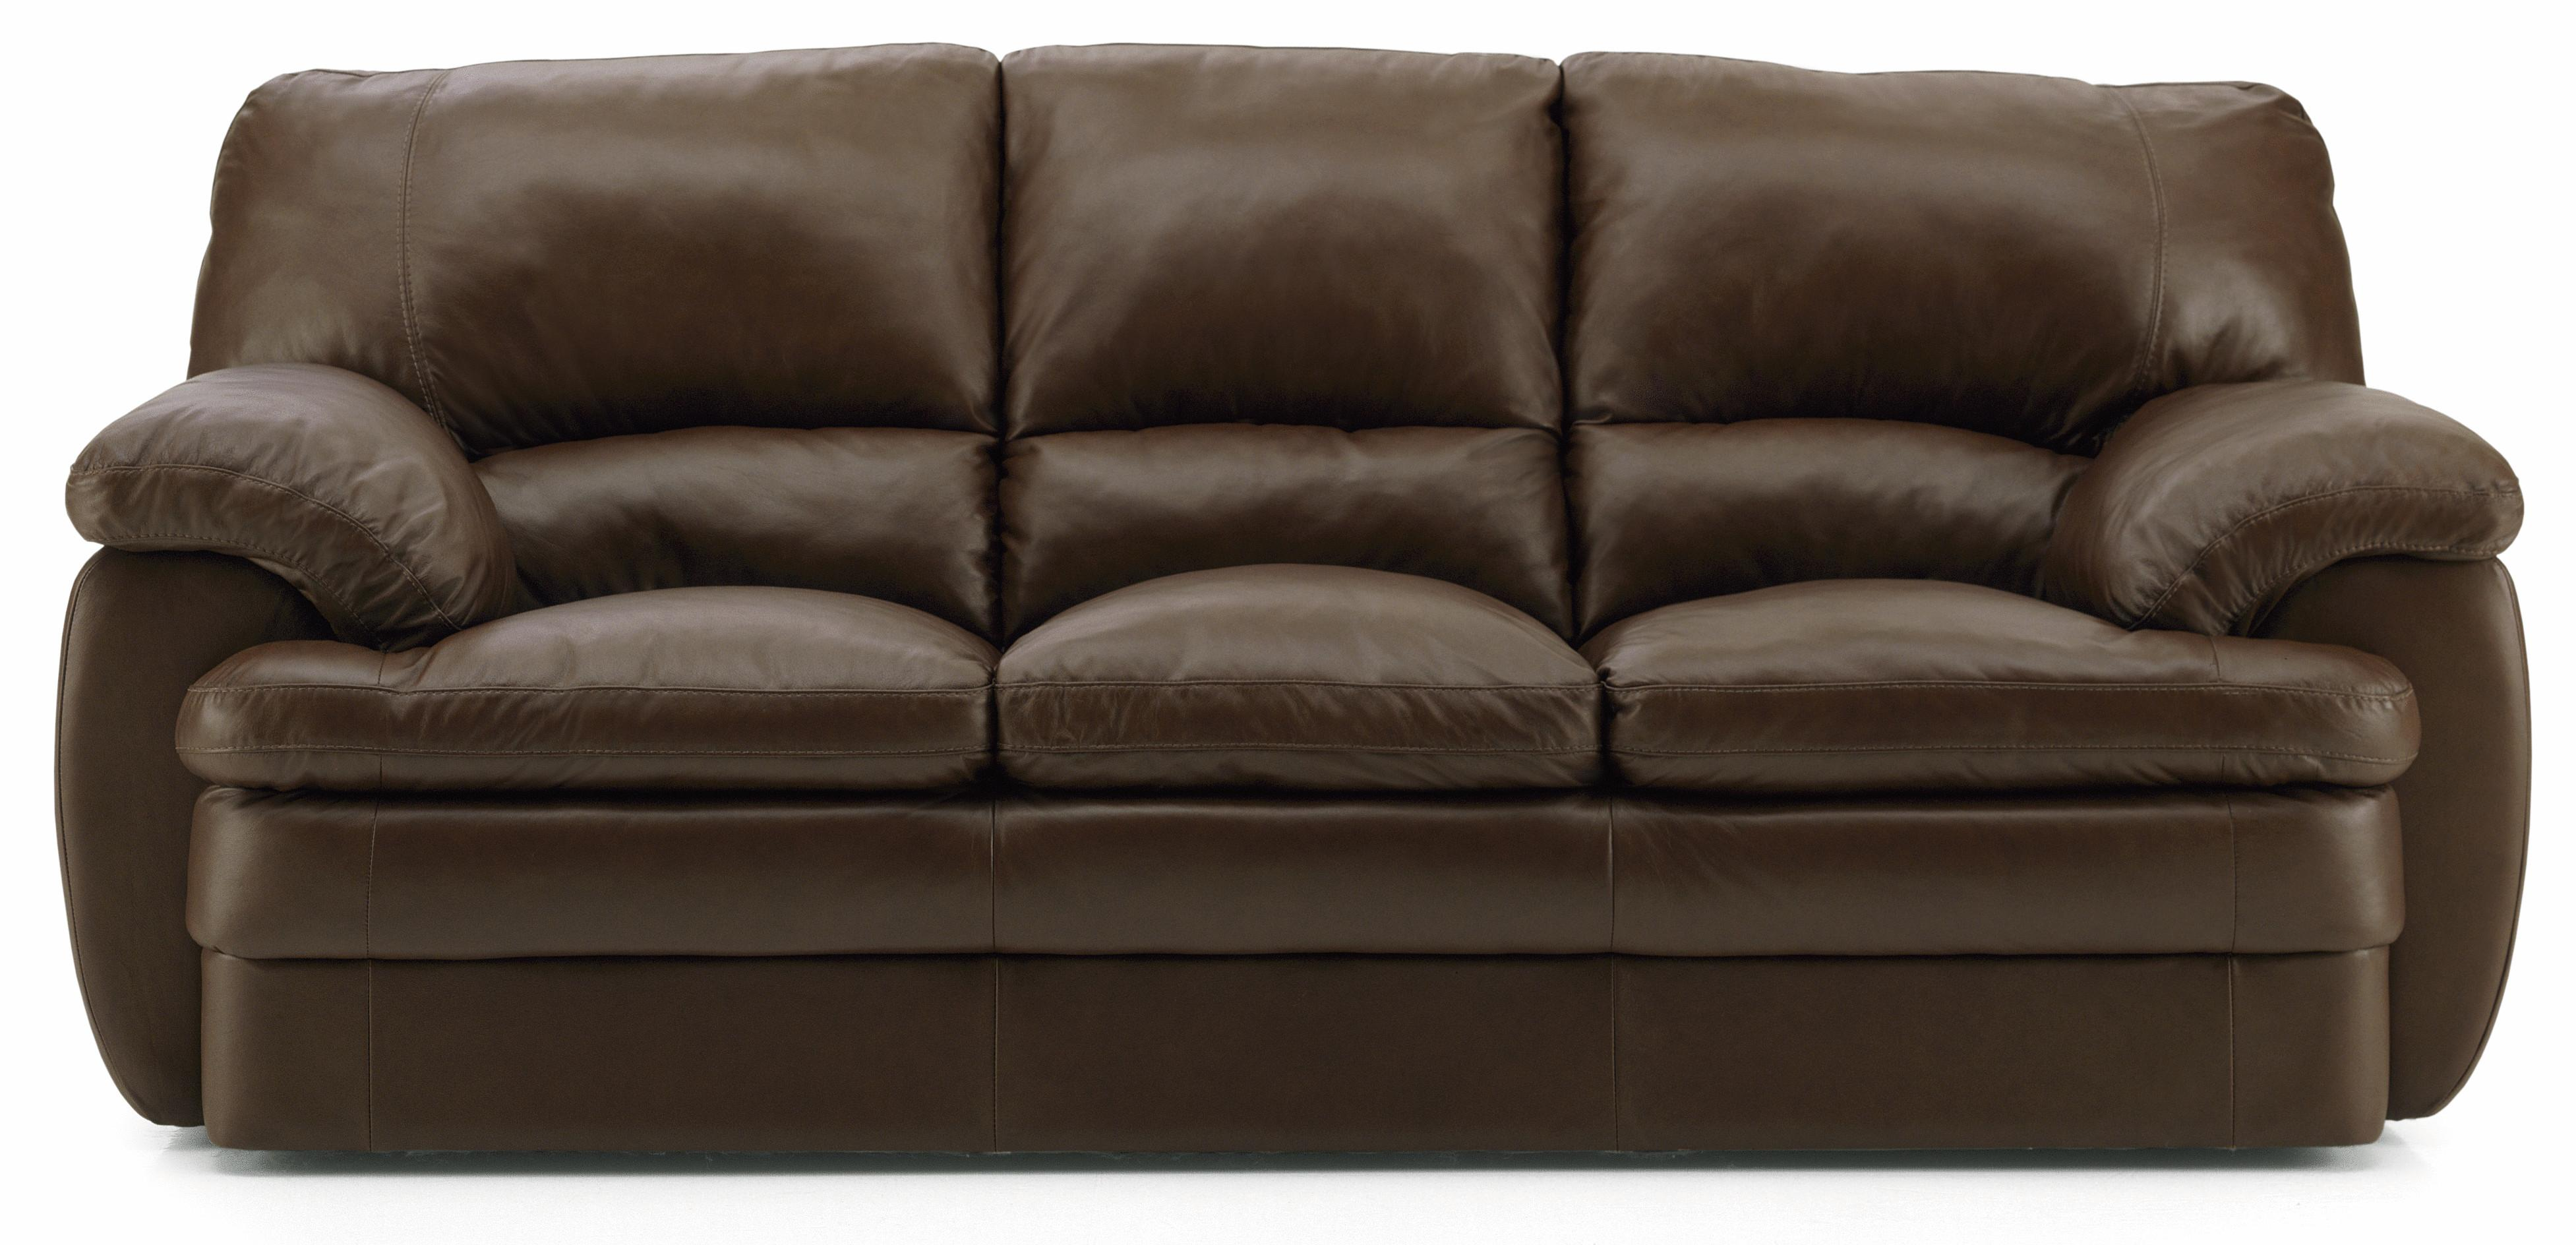 palliser stationary sofas luxury sofa cushions uk marcella pillow top olinde 39s furniture